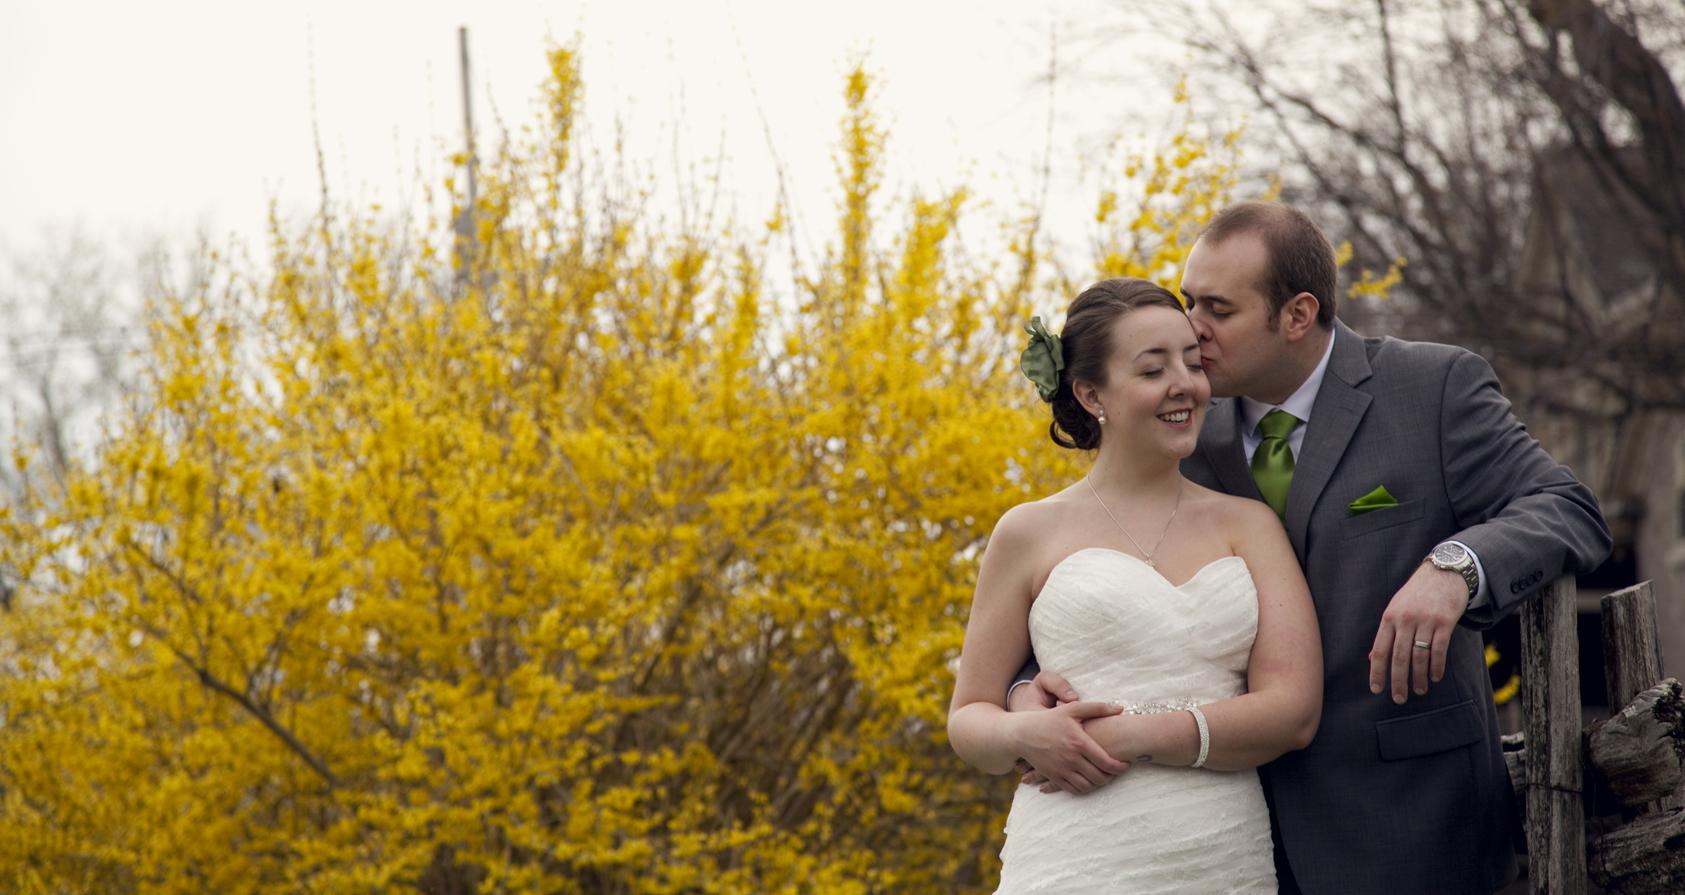 Strathmere Wedding Ottawa Joey Rudd Photography Review Best Ottawa Photographer